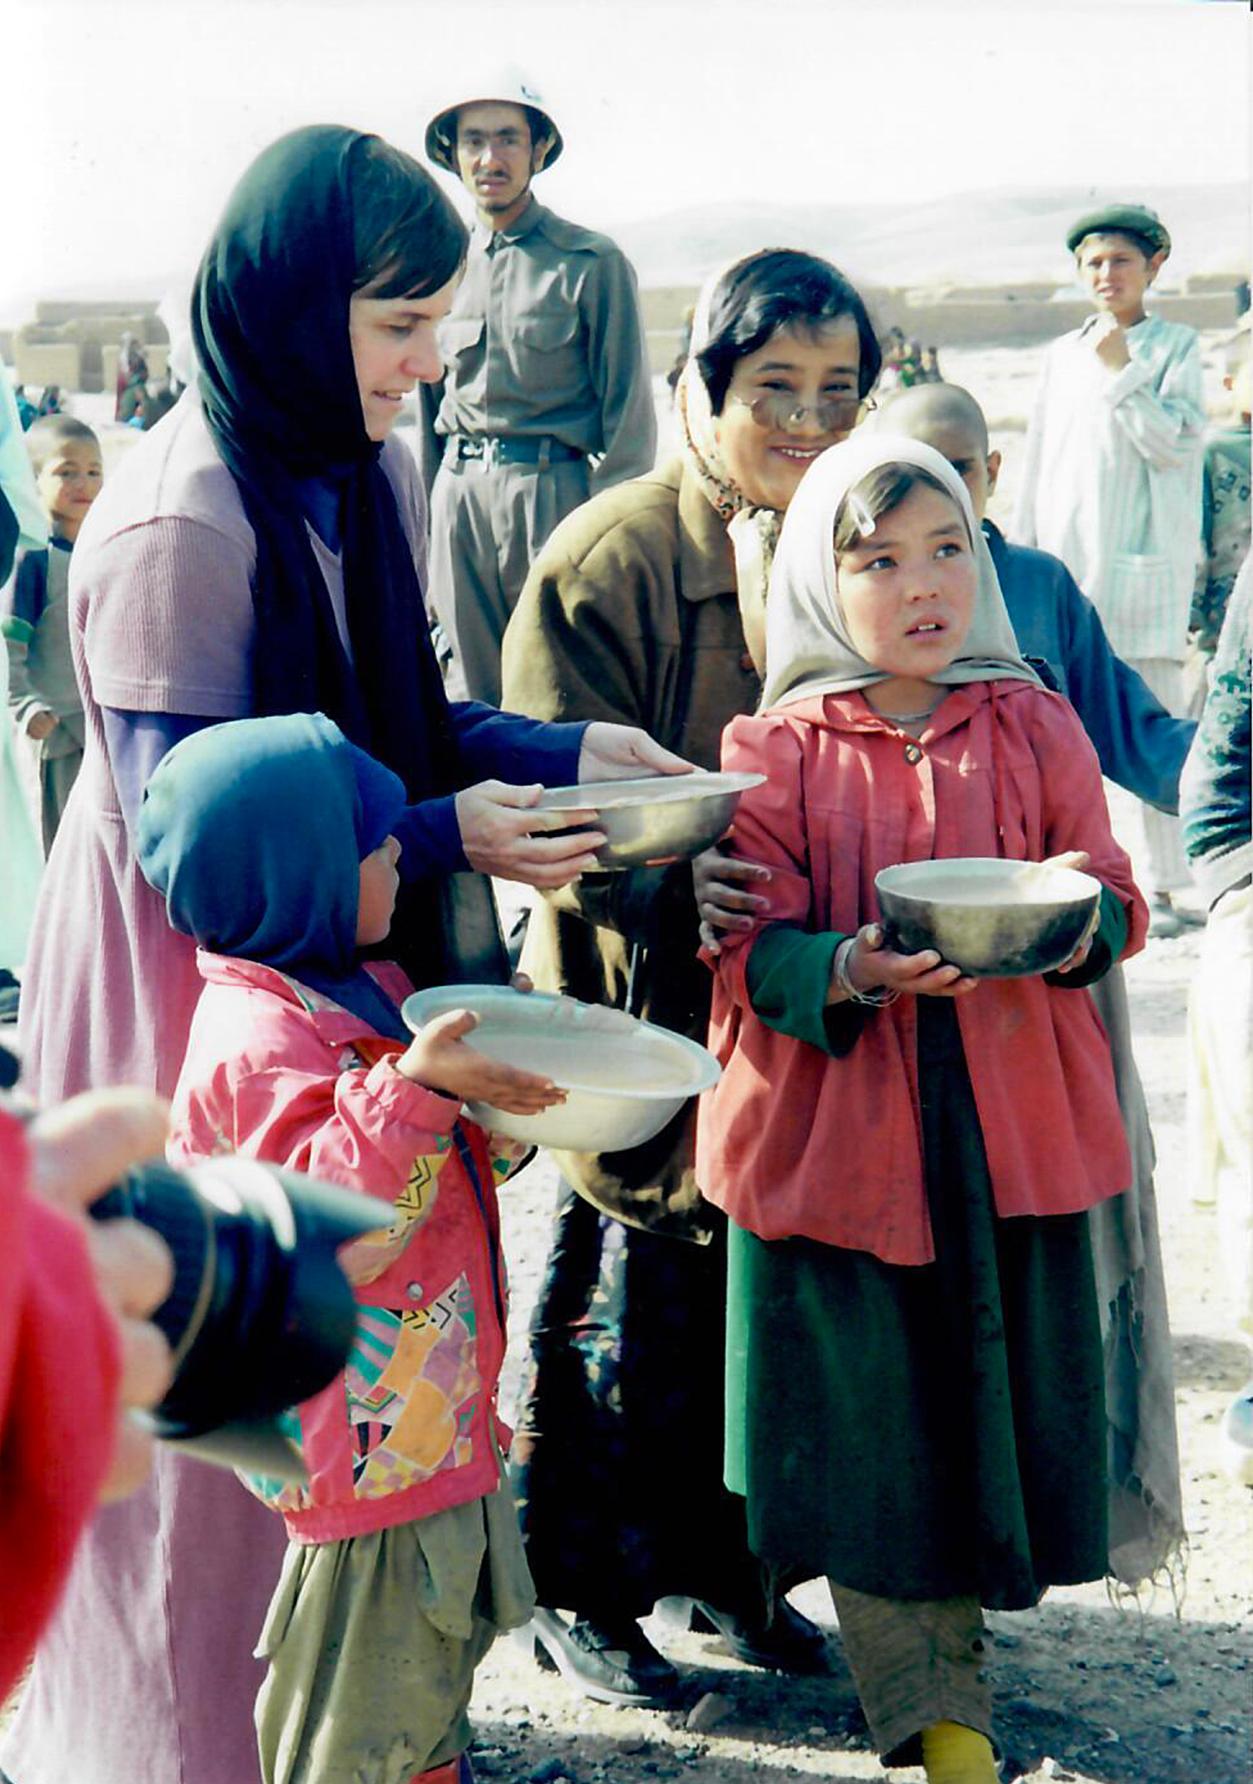 Afghanistan (2002)